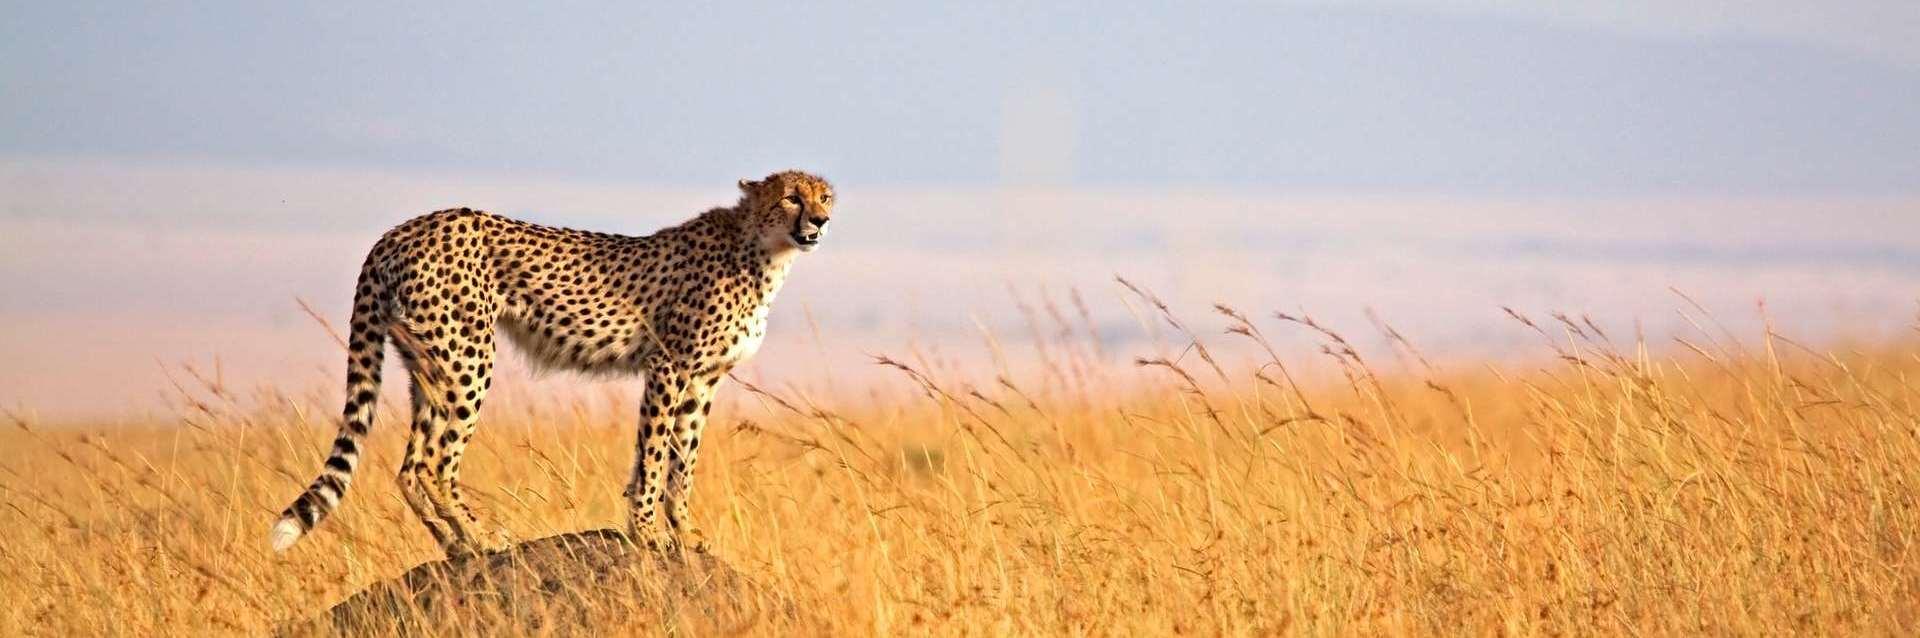 Serengeti plain cheetah scanning fro pray